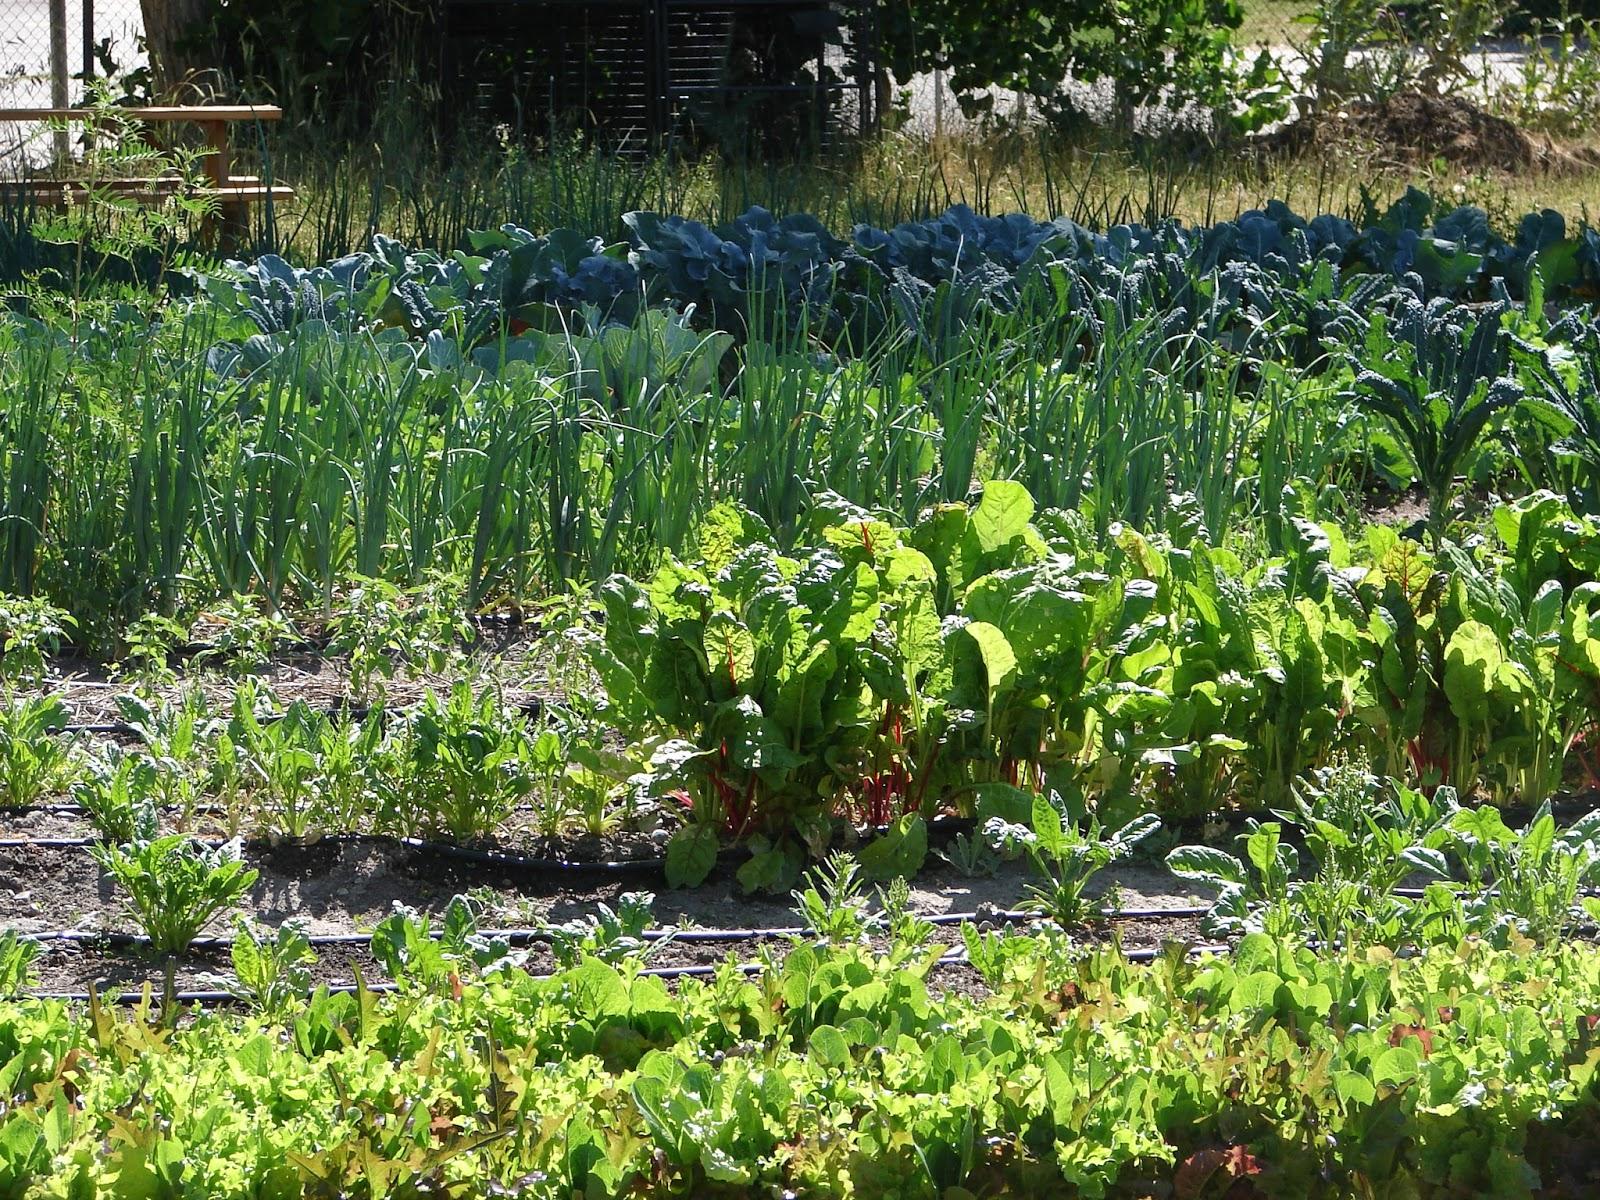 New Utah Gardener 5 Ways To Save Money In The Vegetable